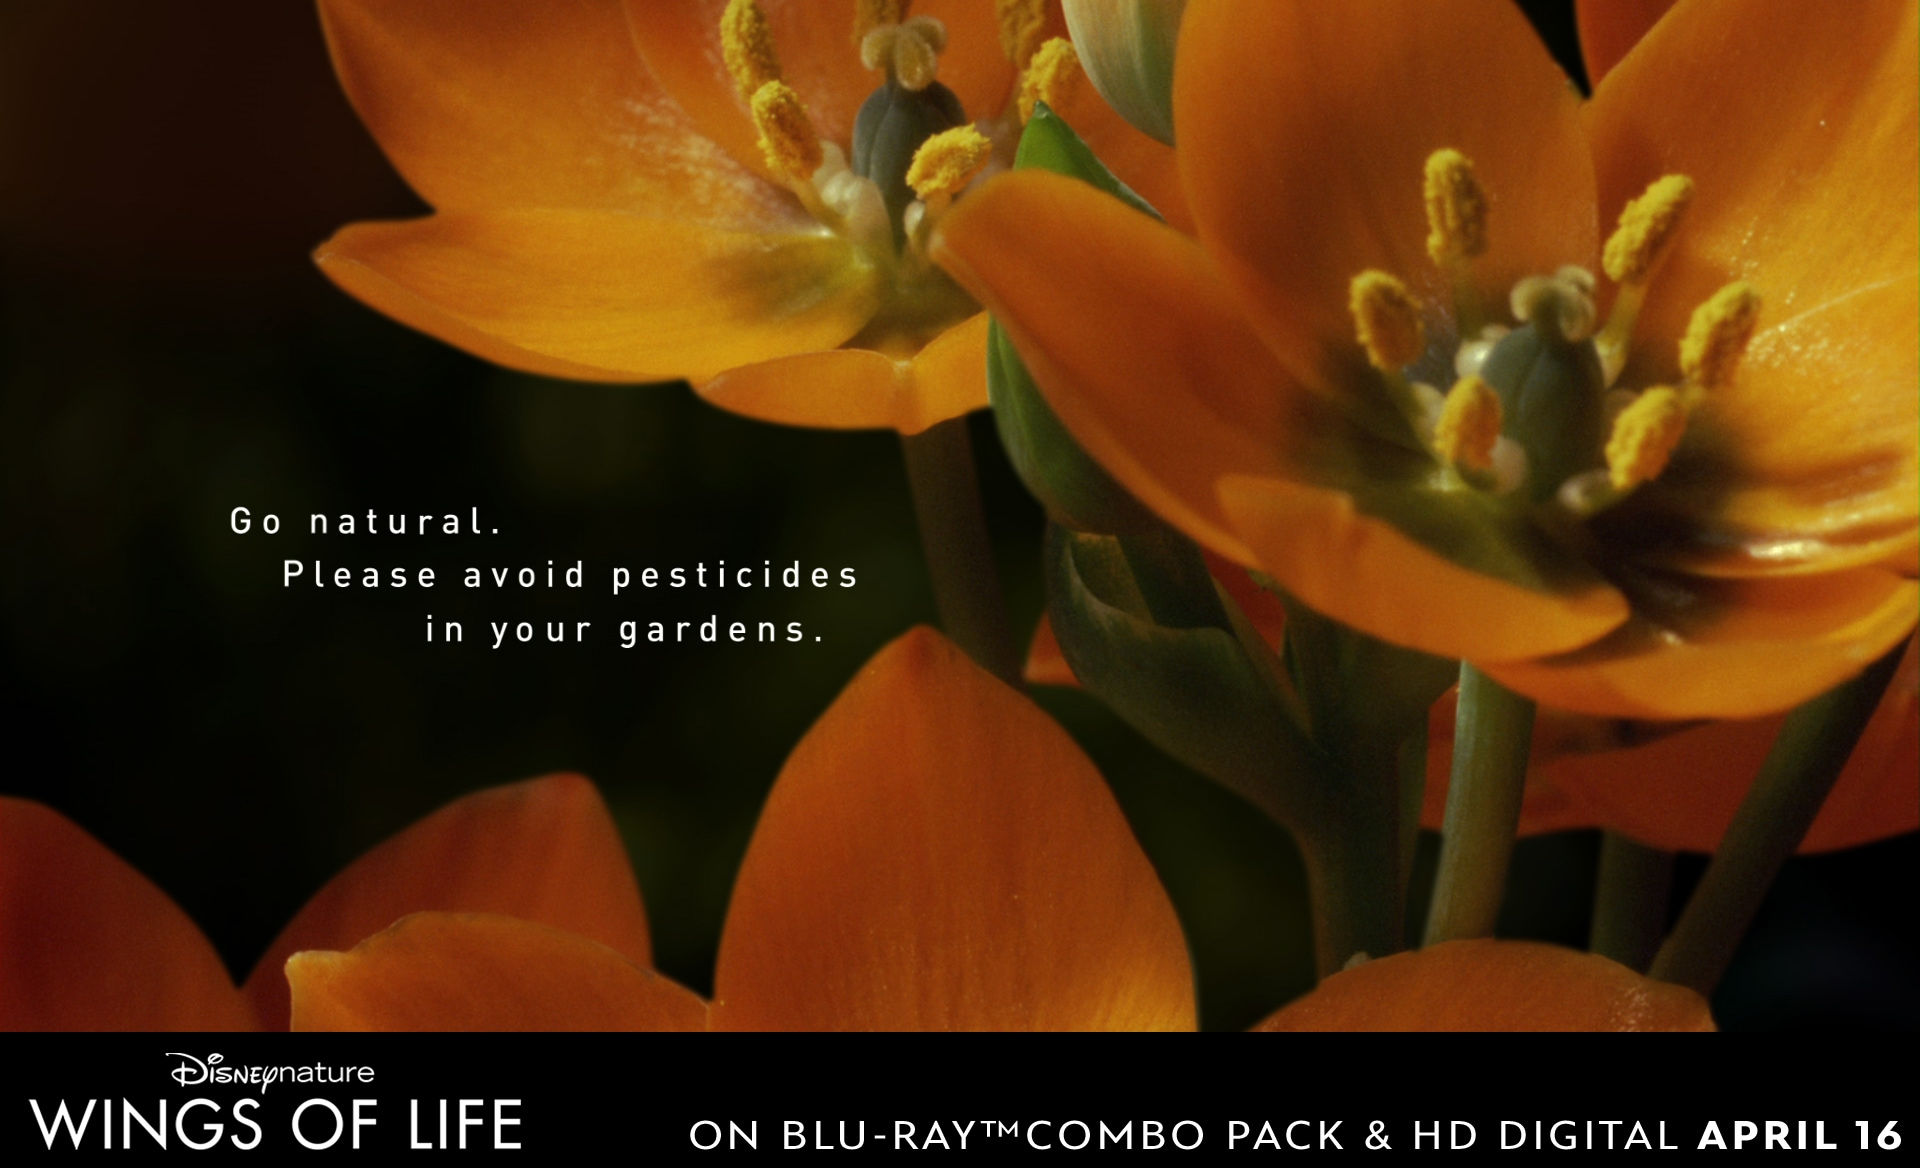 Go natural by avoiding pesticides in your garden.